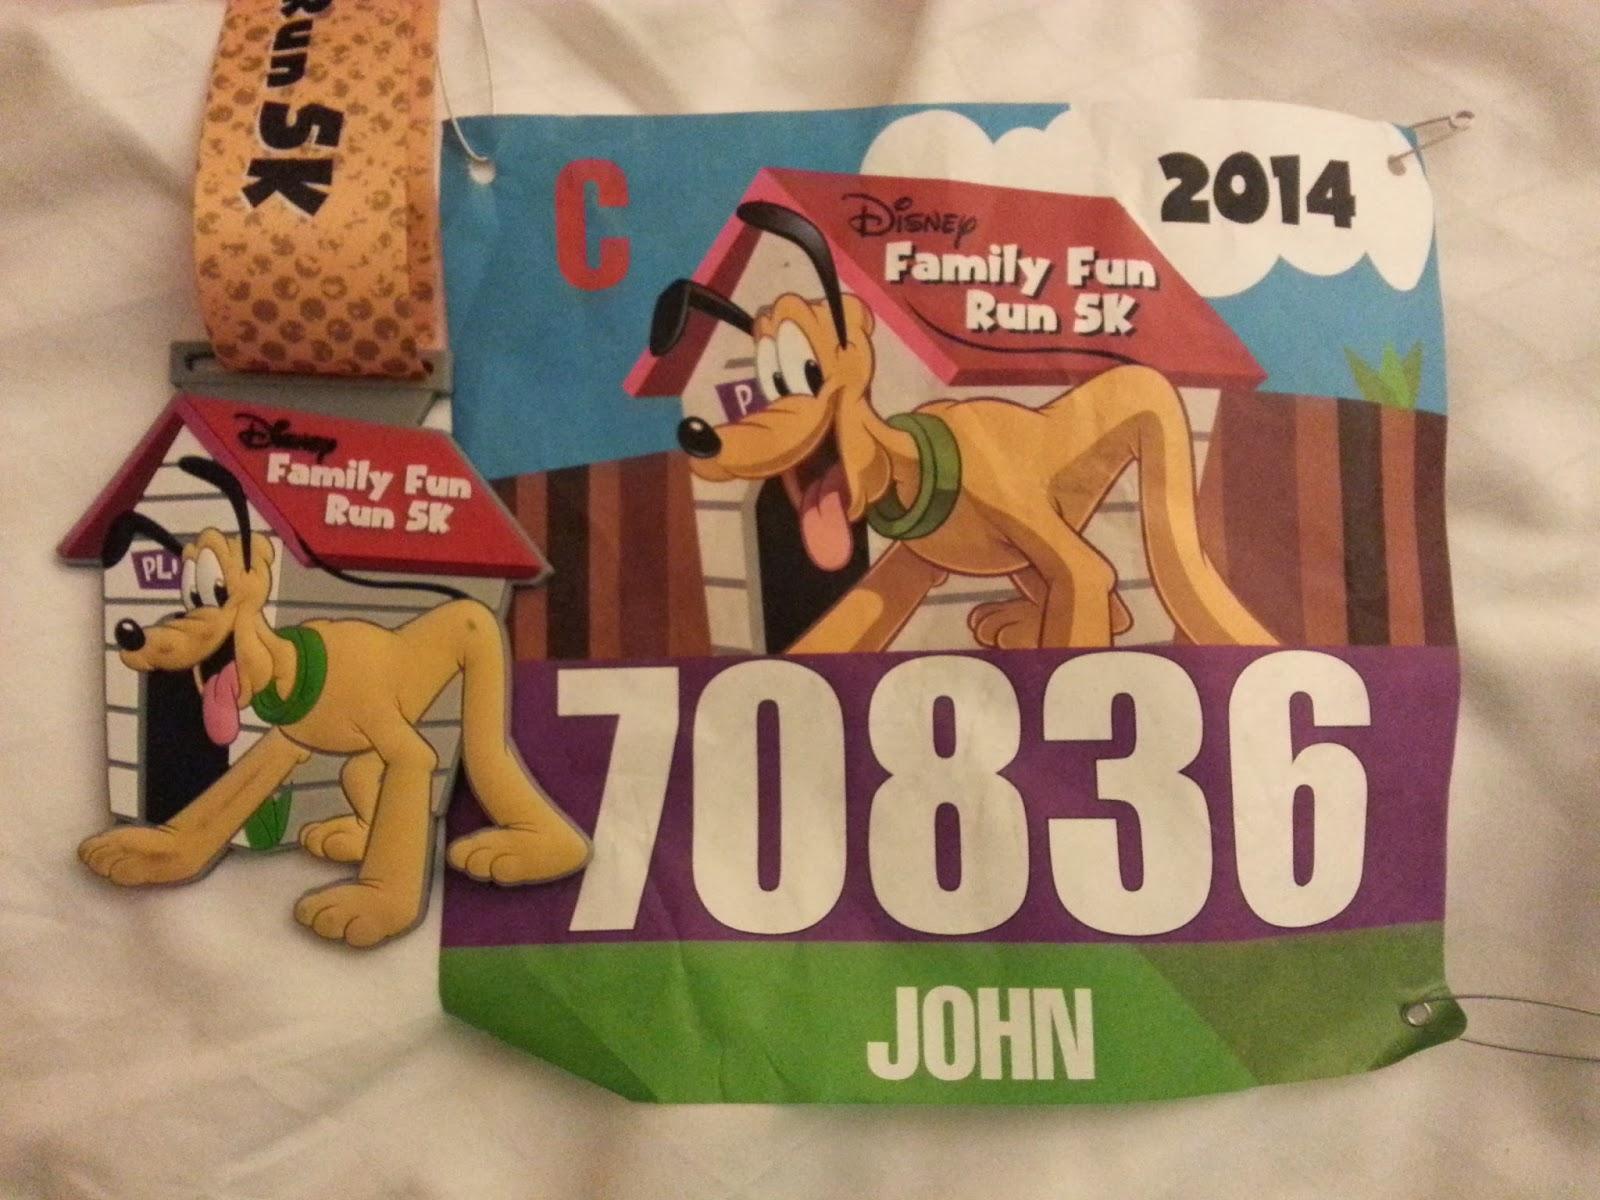 5K medal and bib.